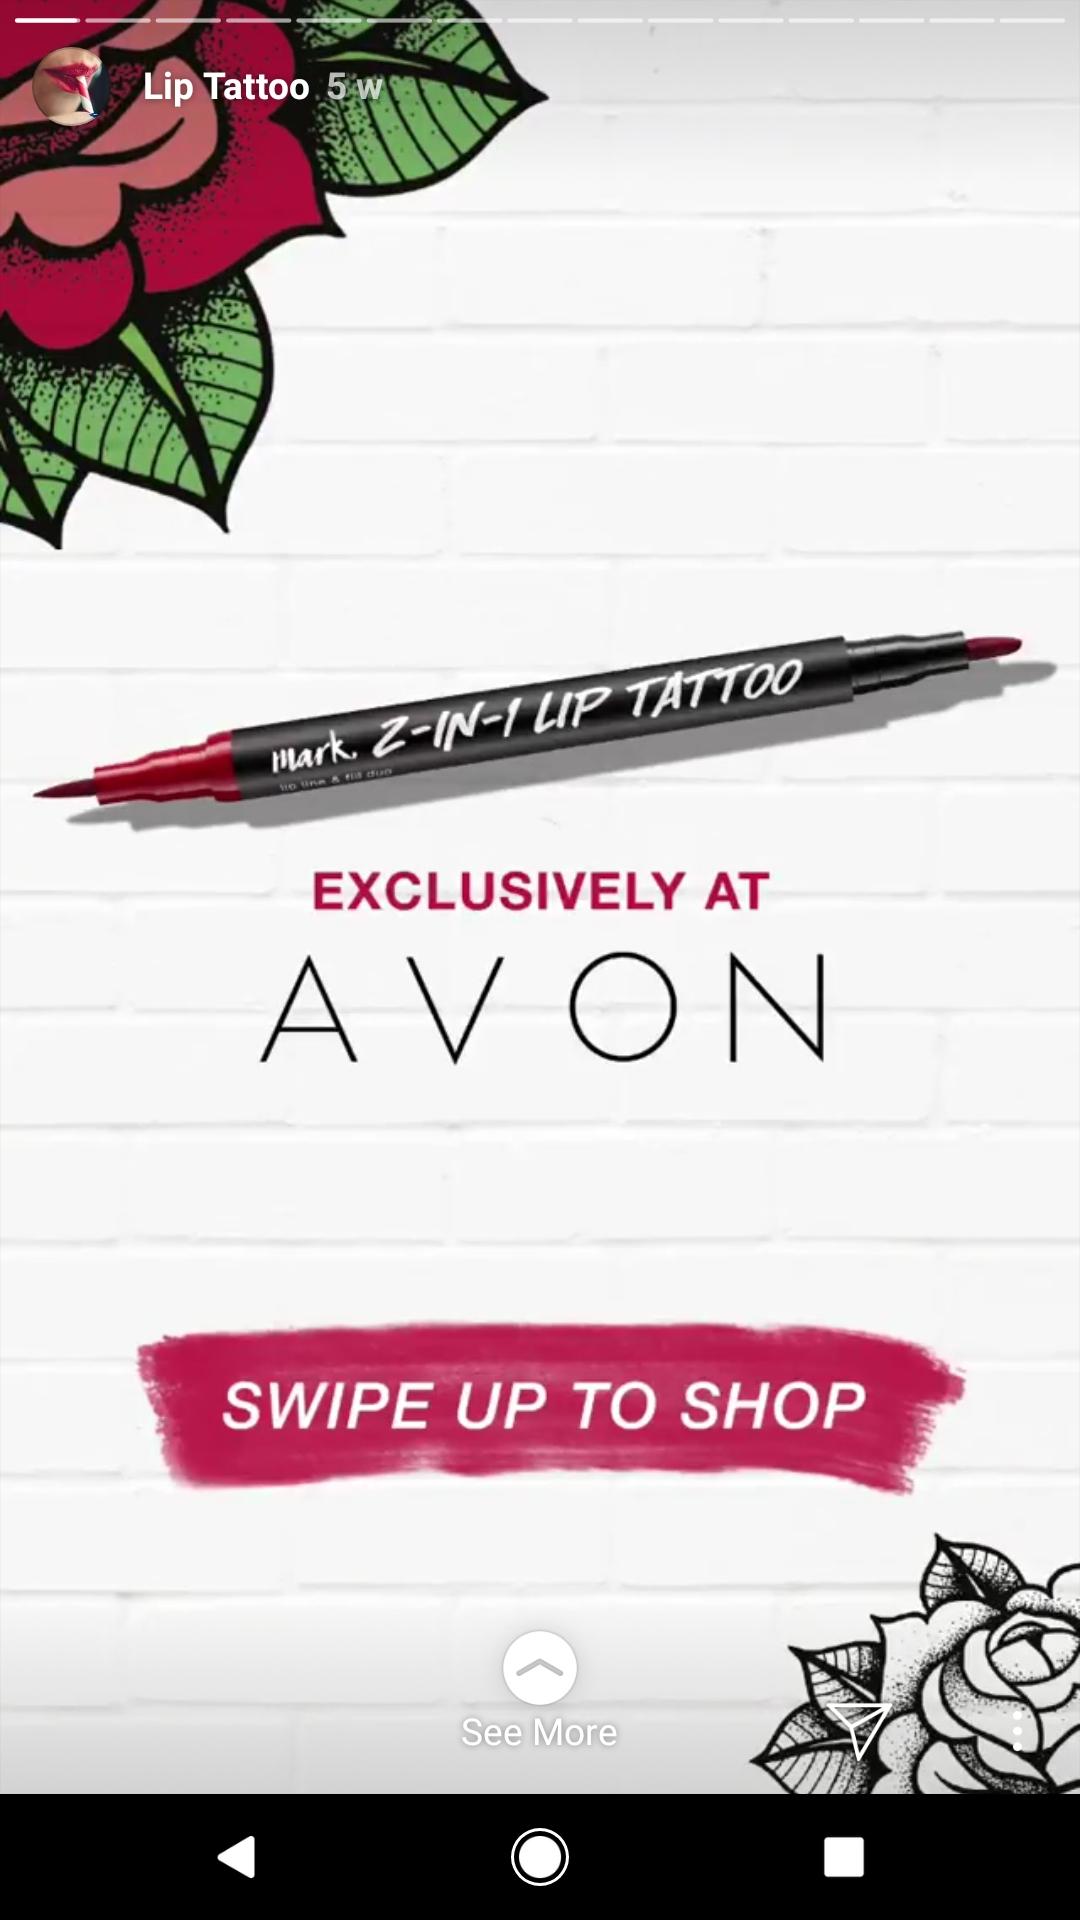 Avon Instagram story ad